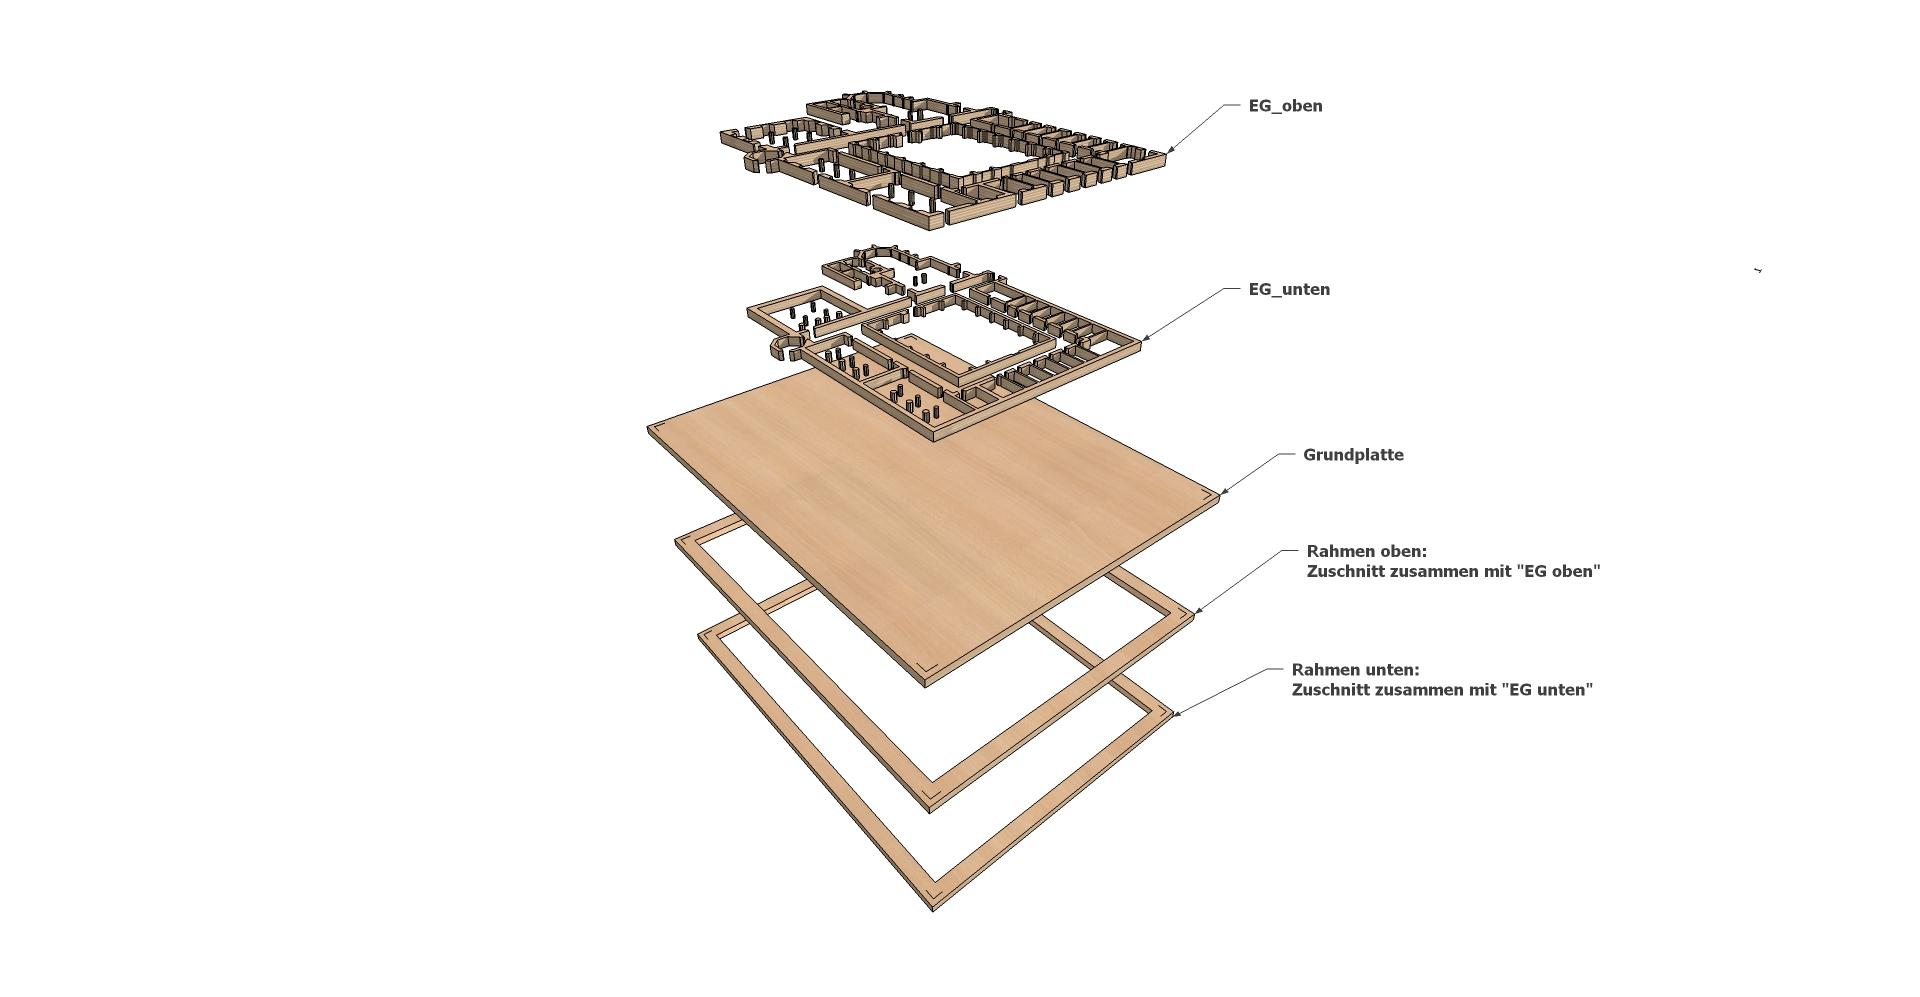 ARCHITEKTURMODELL HOSPITAL KUES